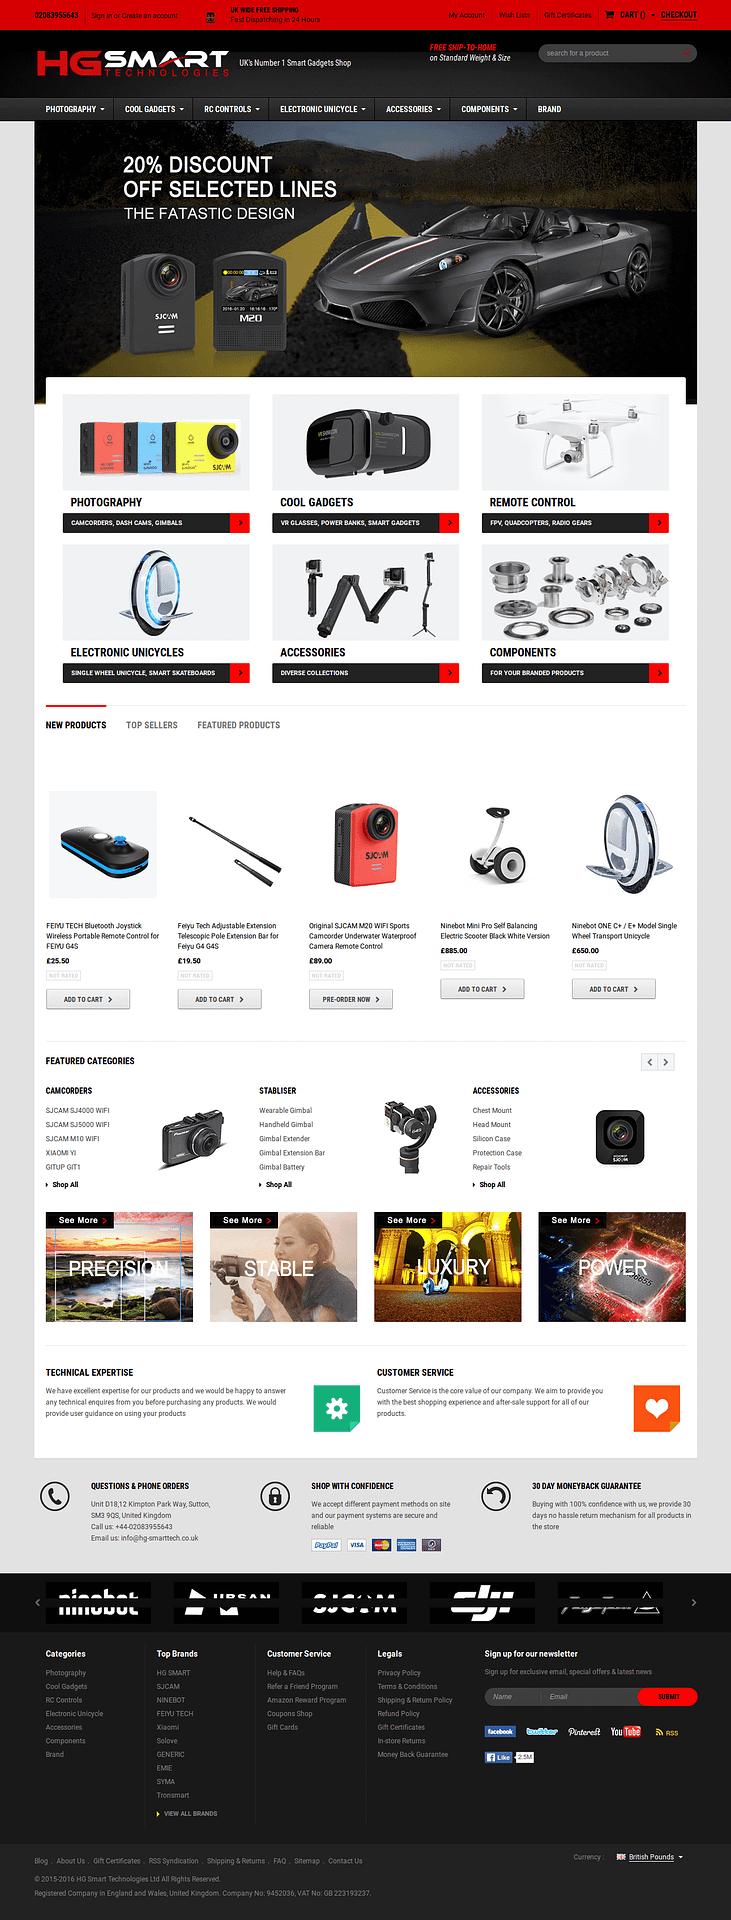 HG Smart Technologies